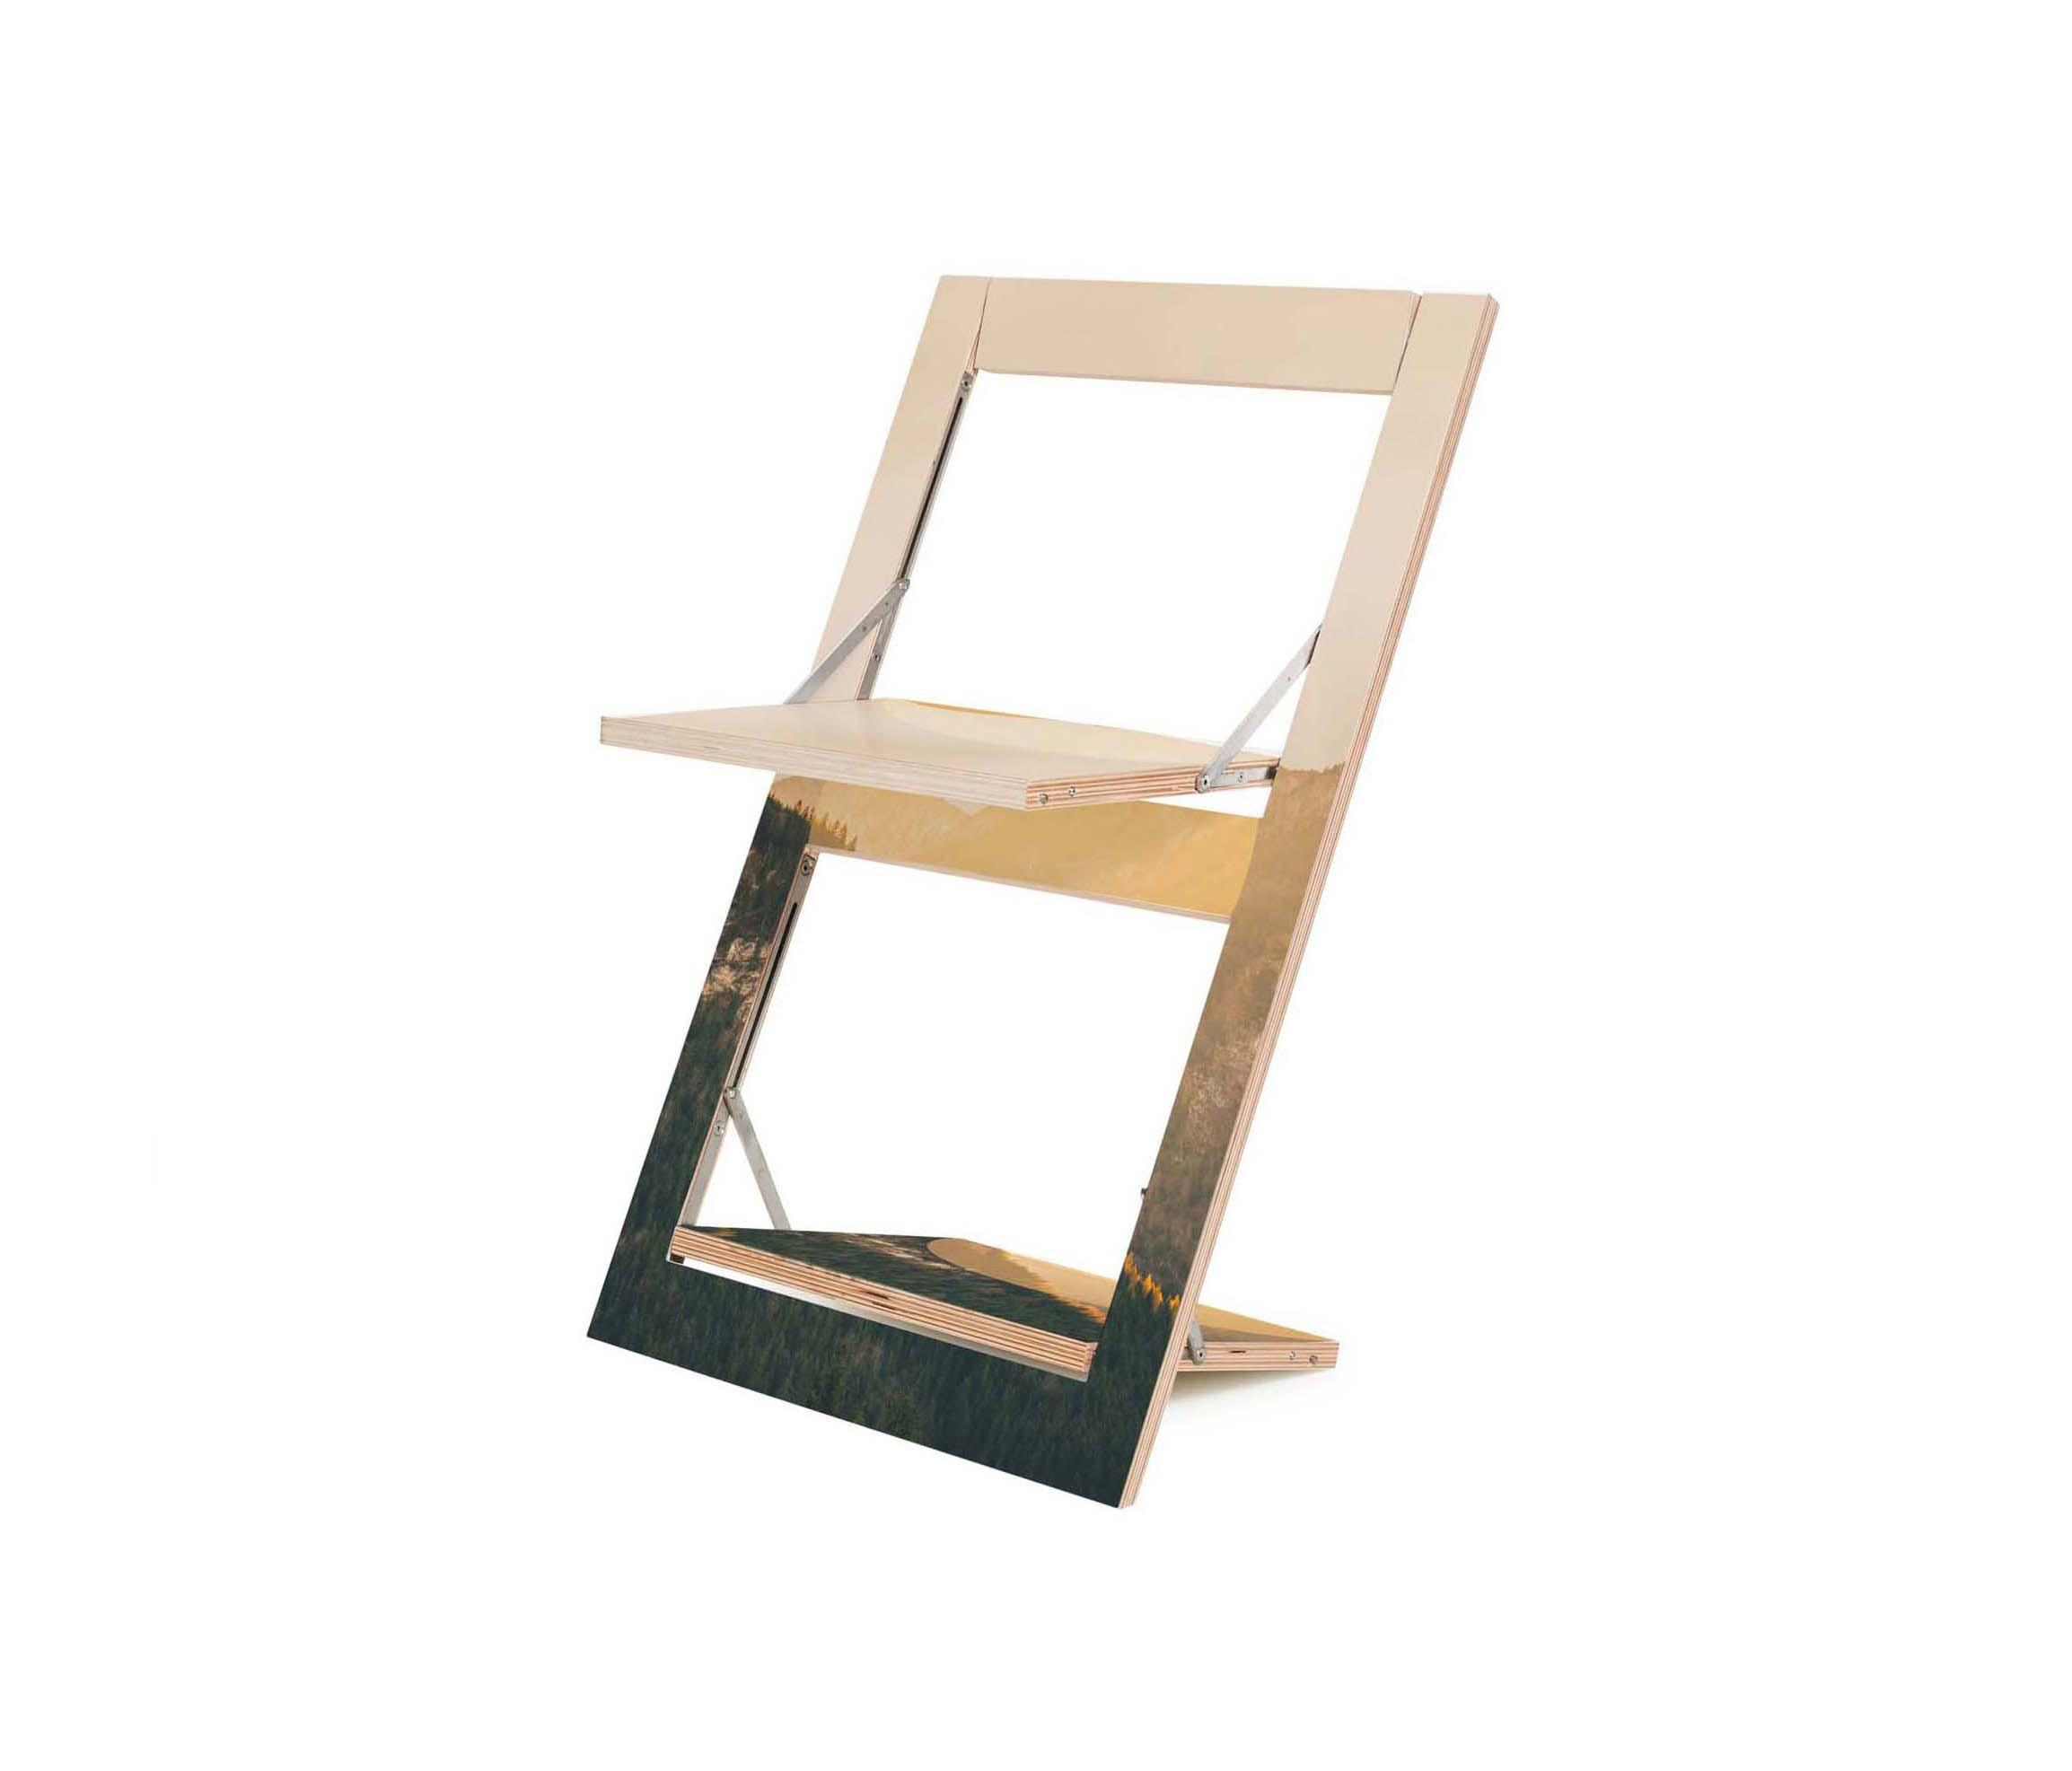 Fläpps Folding Chair Alps By Joe Mania Ambivalenz Chairs